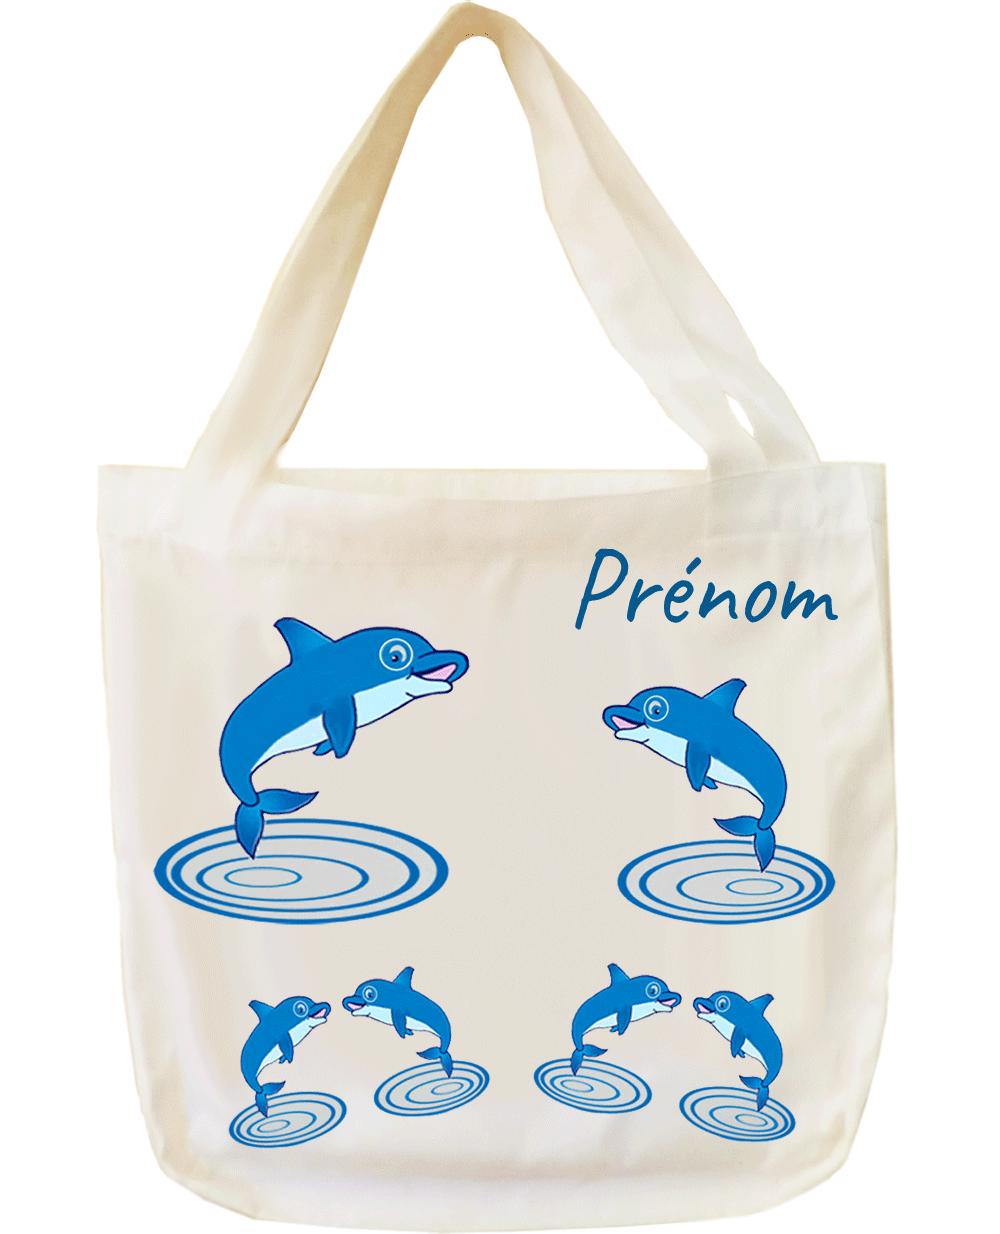 tote-bag;sac;cabas;texti;cadeaux;personnalisable;personnalisation;personnalise;prenom;animal;dauphin